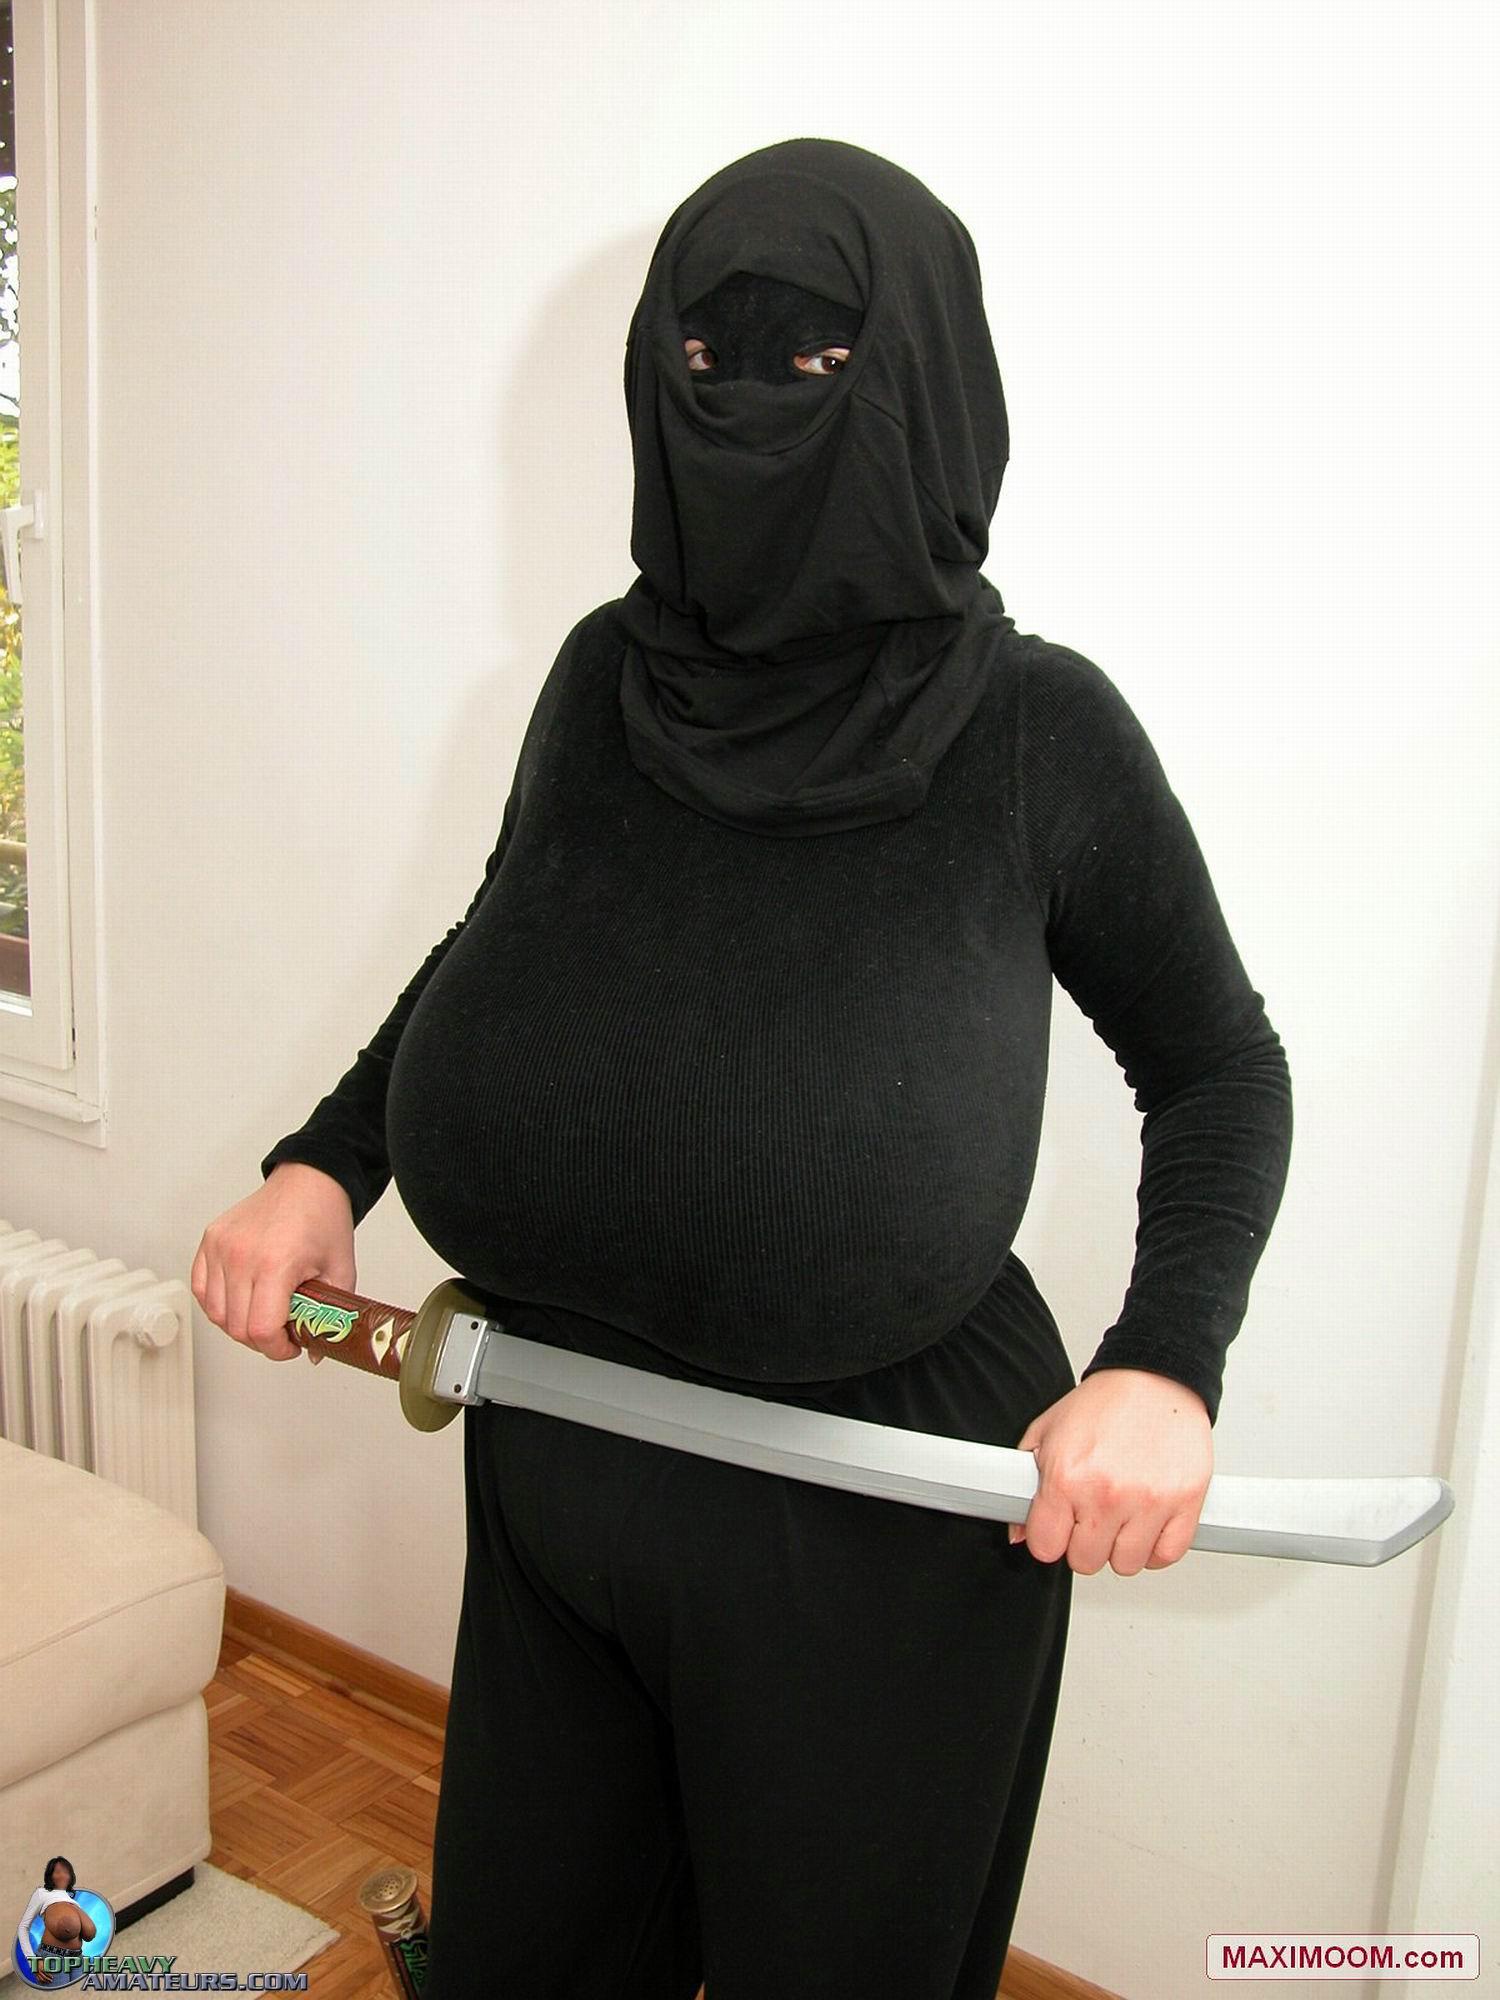 Can Big boob female ninja